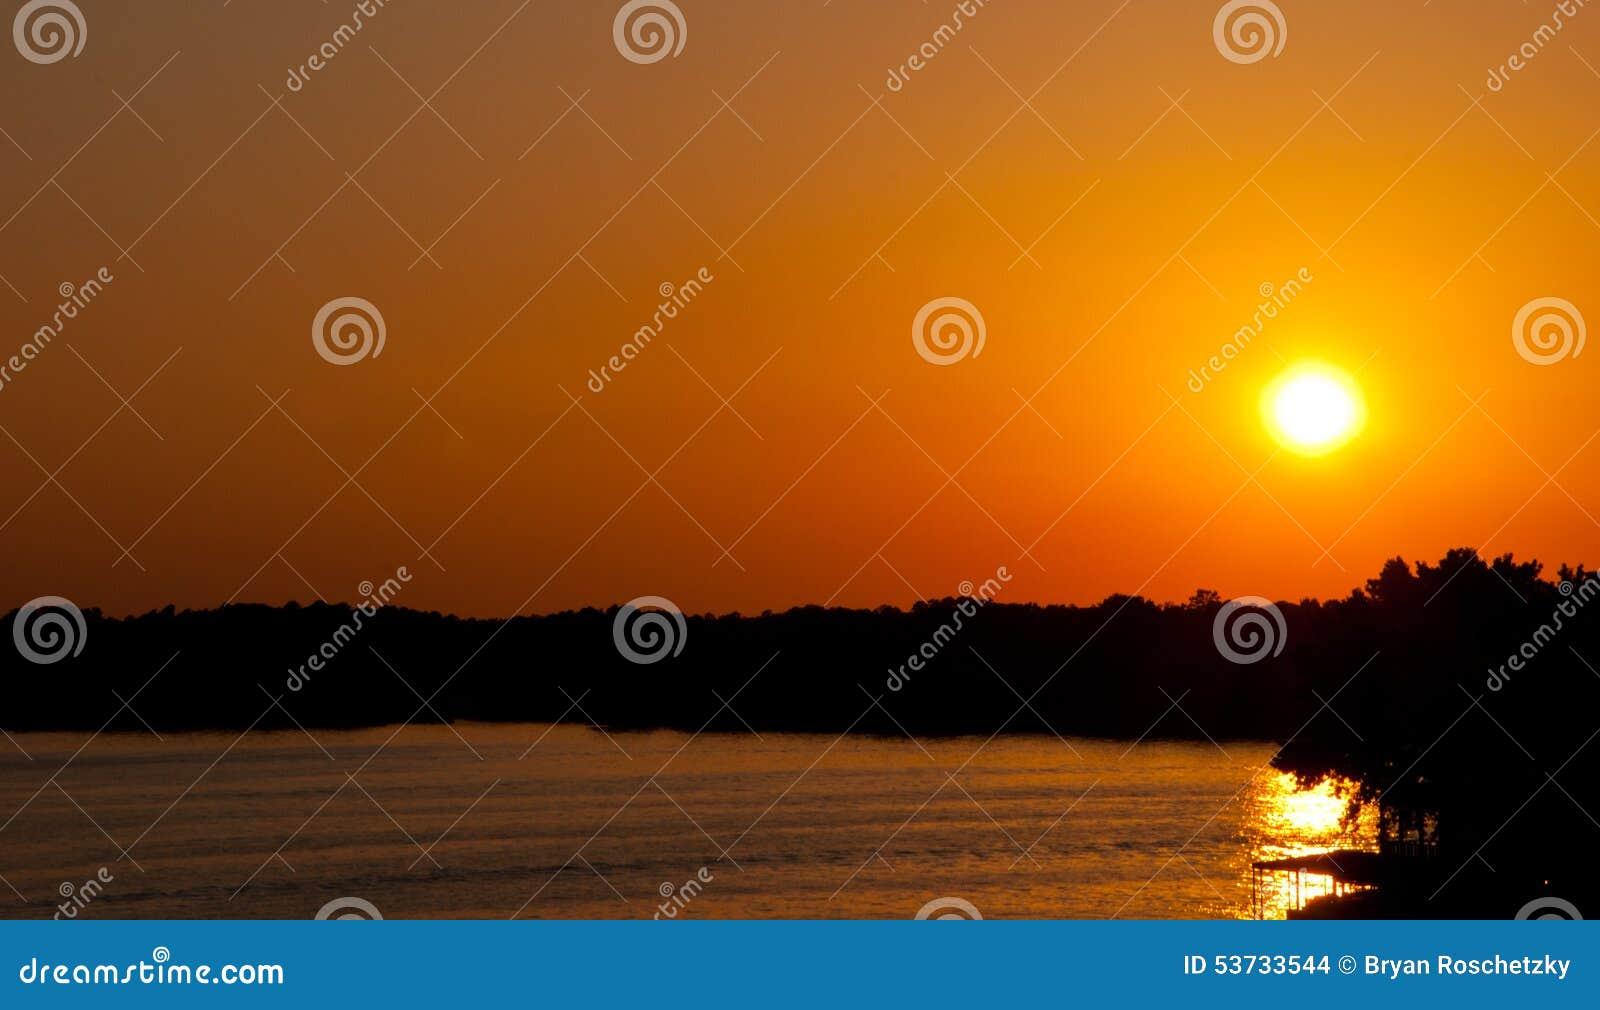 Arkansas Ozark Mountain Sunset golpea la selva tropical del horizonte